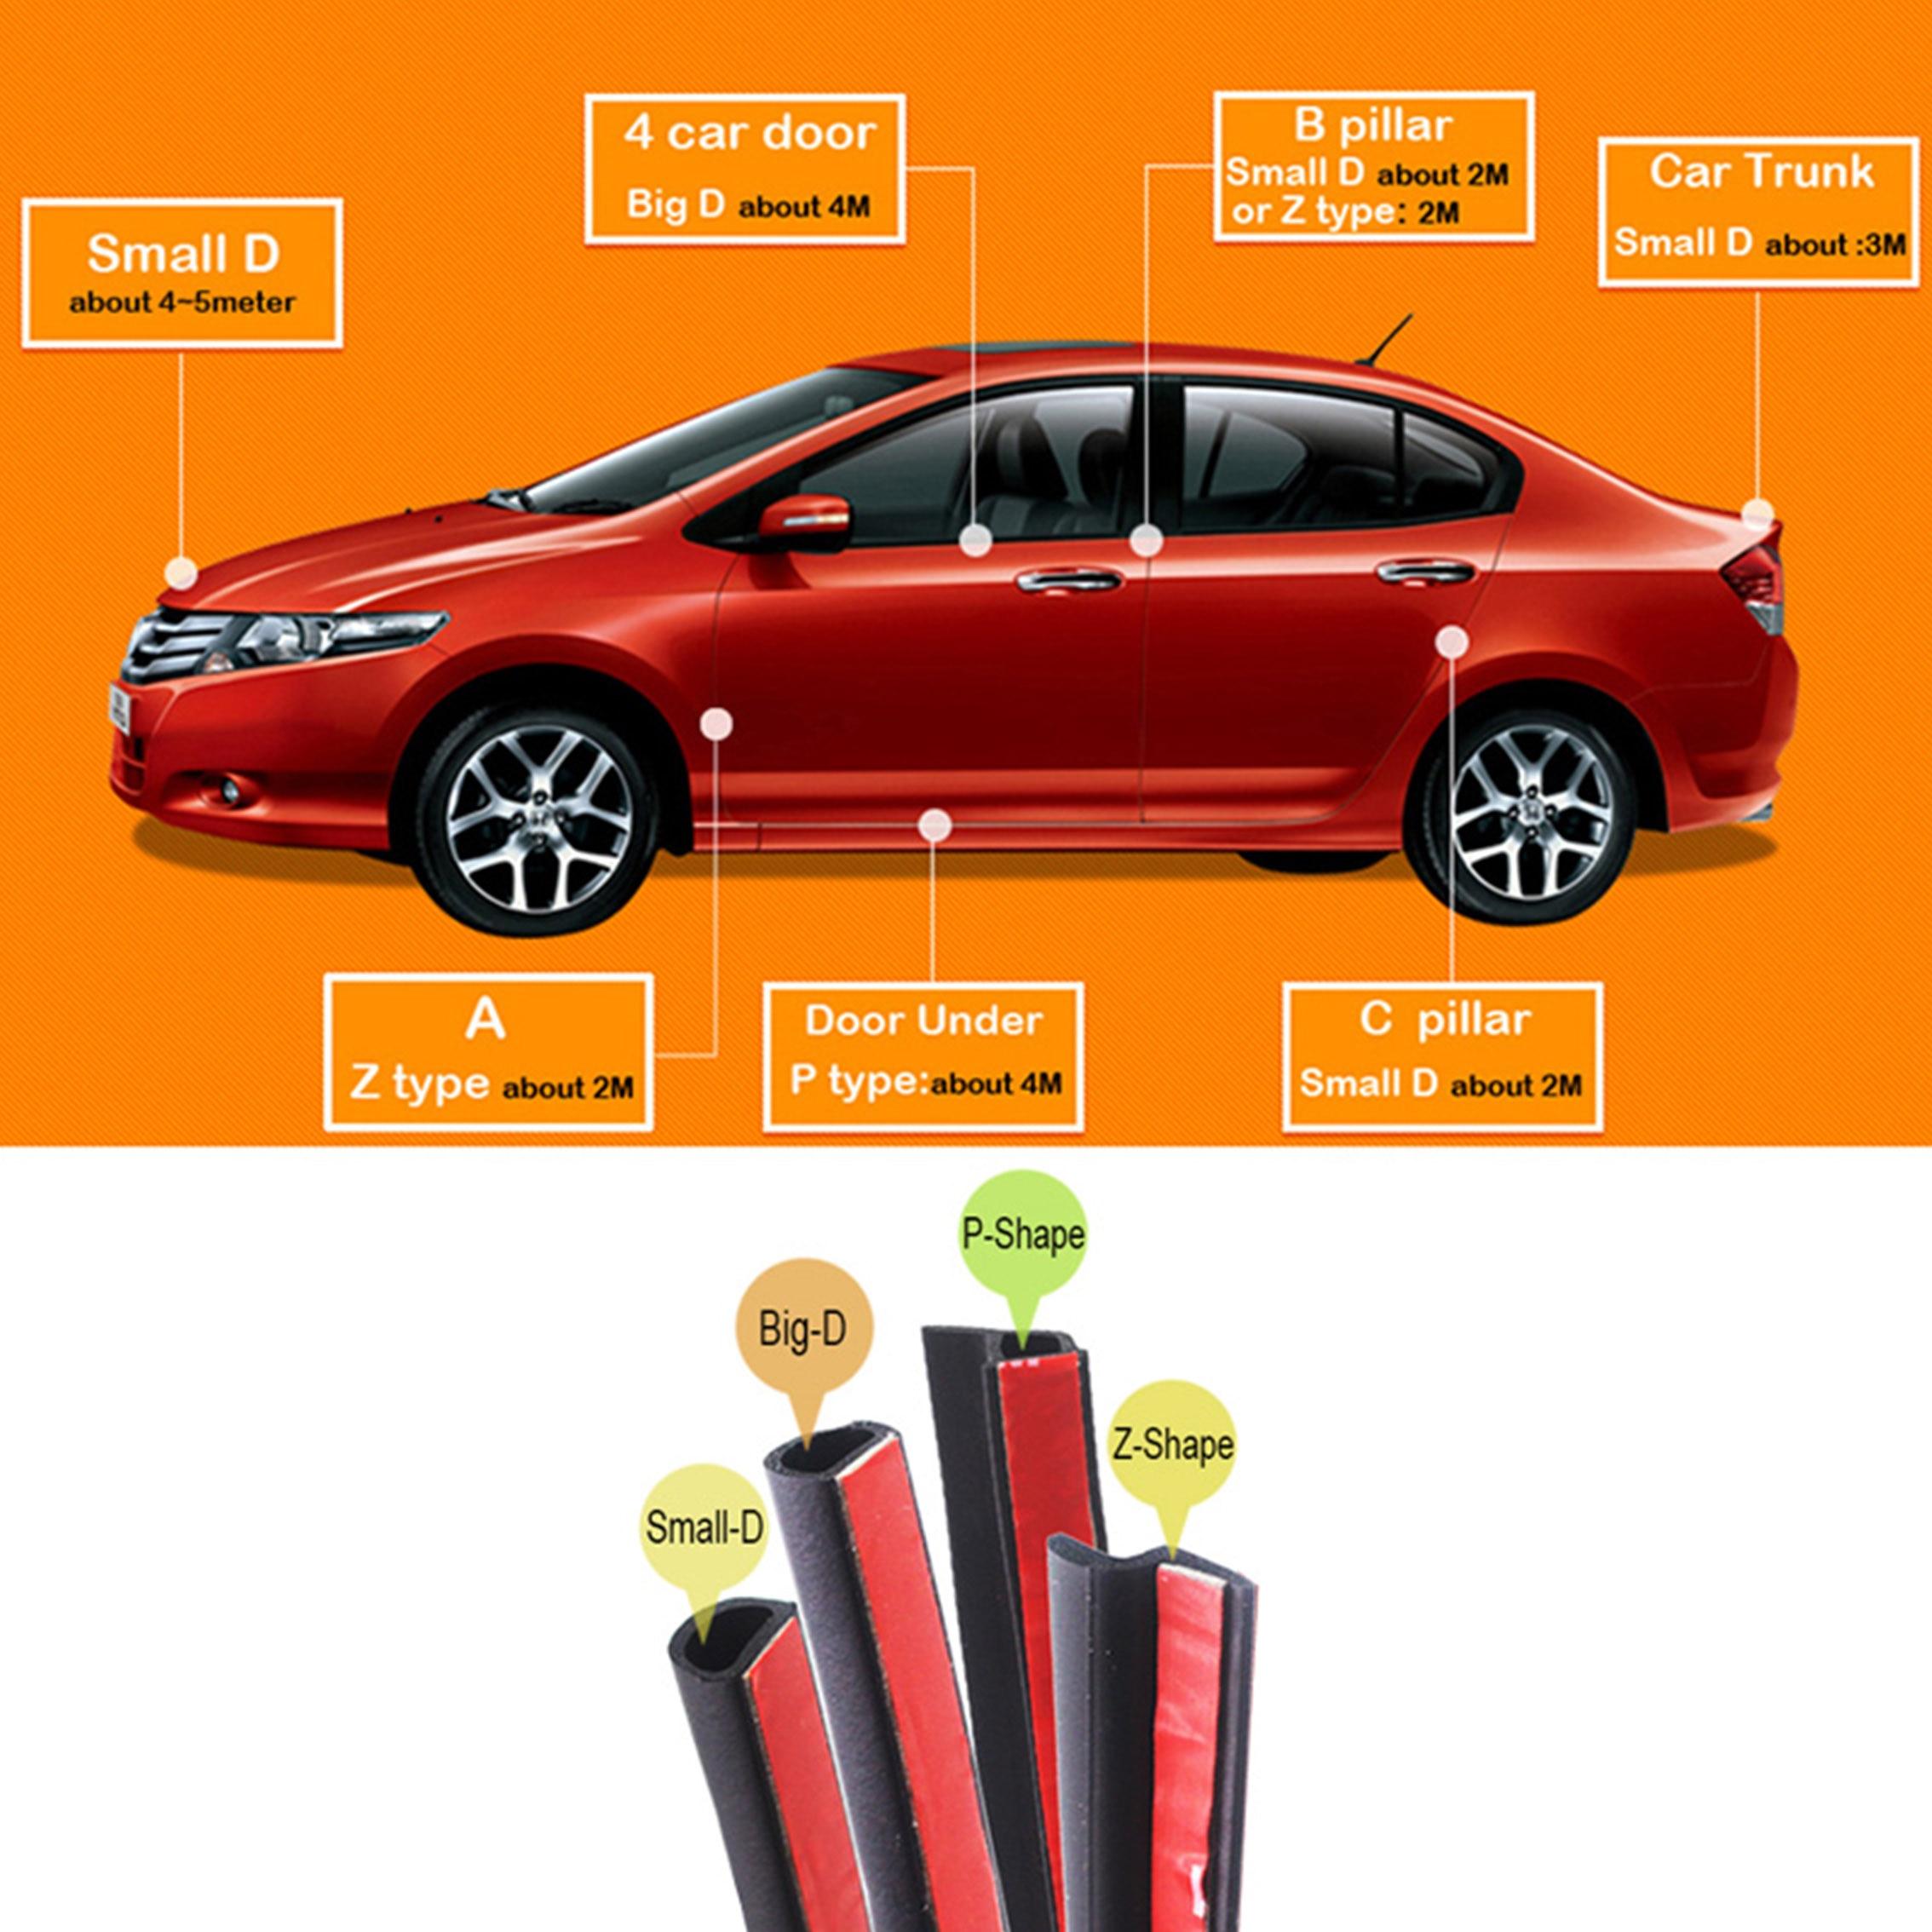 Krada T Type Auto Rubber Seals 1.6m Windshield Seal Adhesive Strips Car Styling For Vw Bmw E36 E39 E60 X1 Passat Mazda Kia Rio Paint & Window Repair Tool